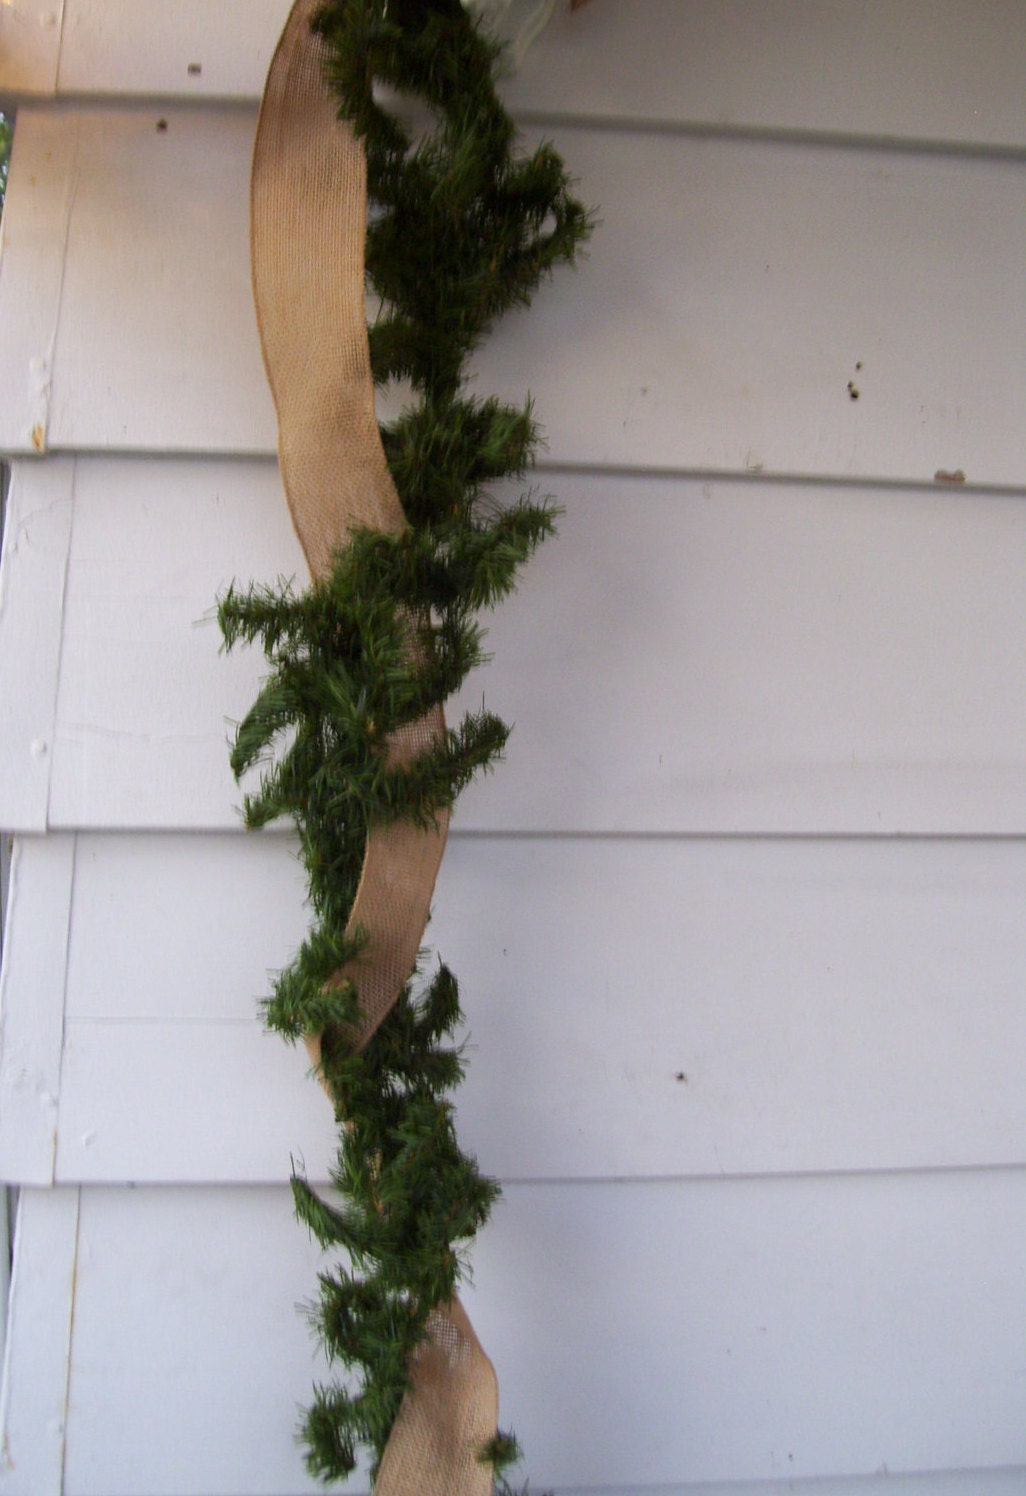 On Sale 15 Ft Christmas Pine Garland Artificial Garland